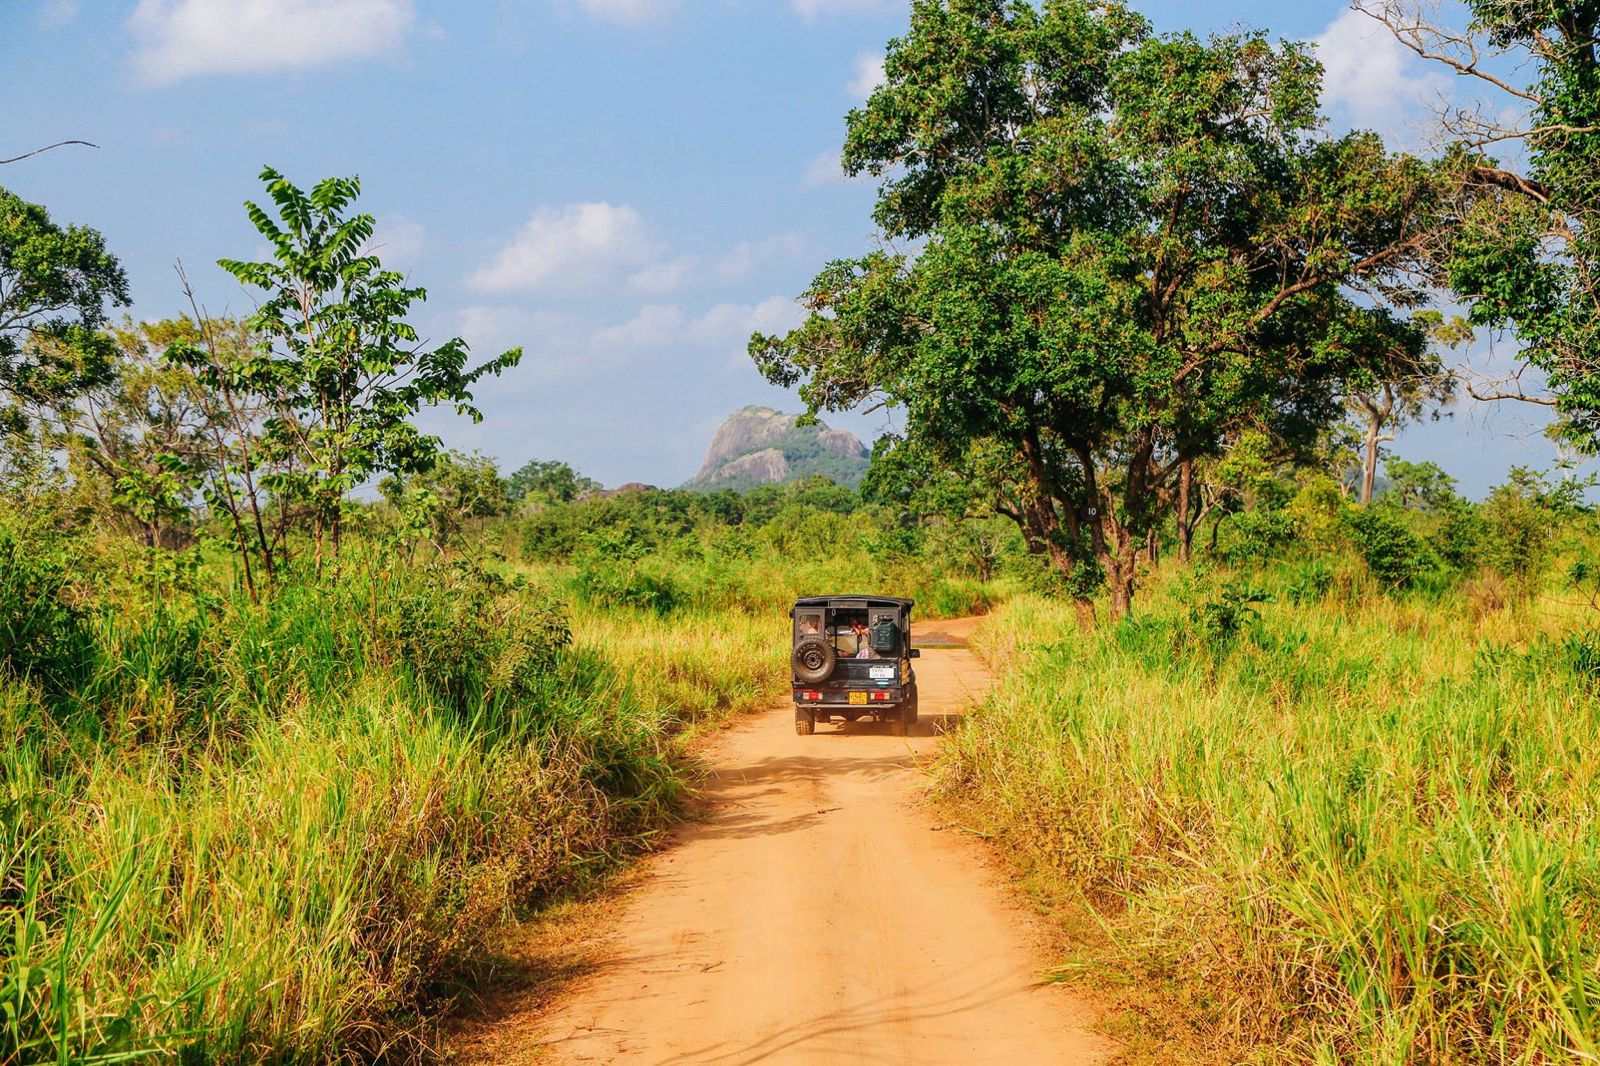 Safari in Mineriya National Park Sri Lanka Elephants (5)